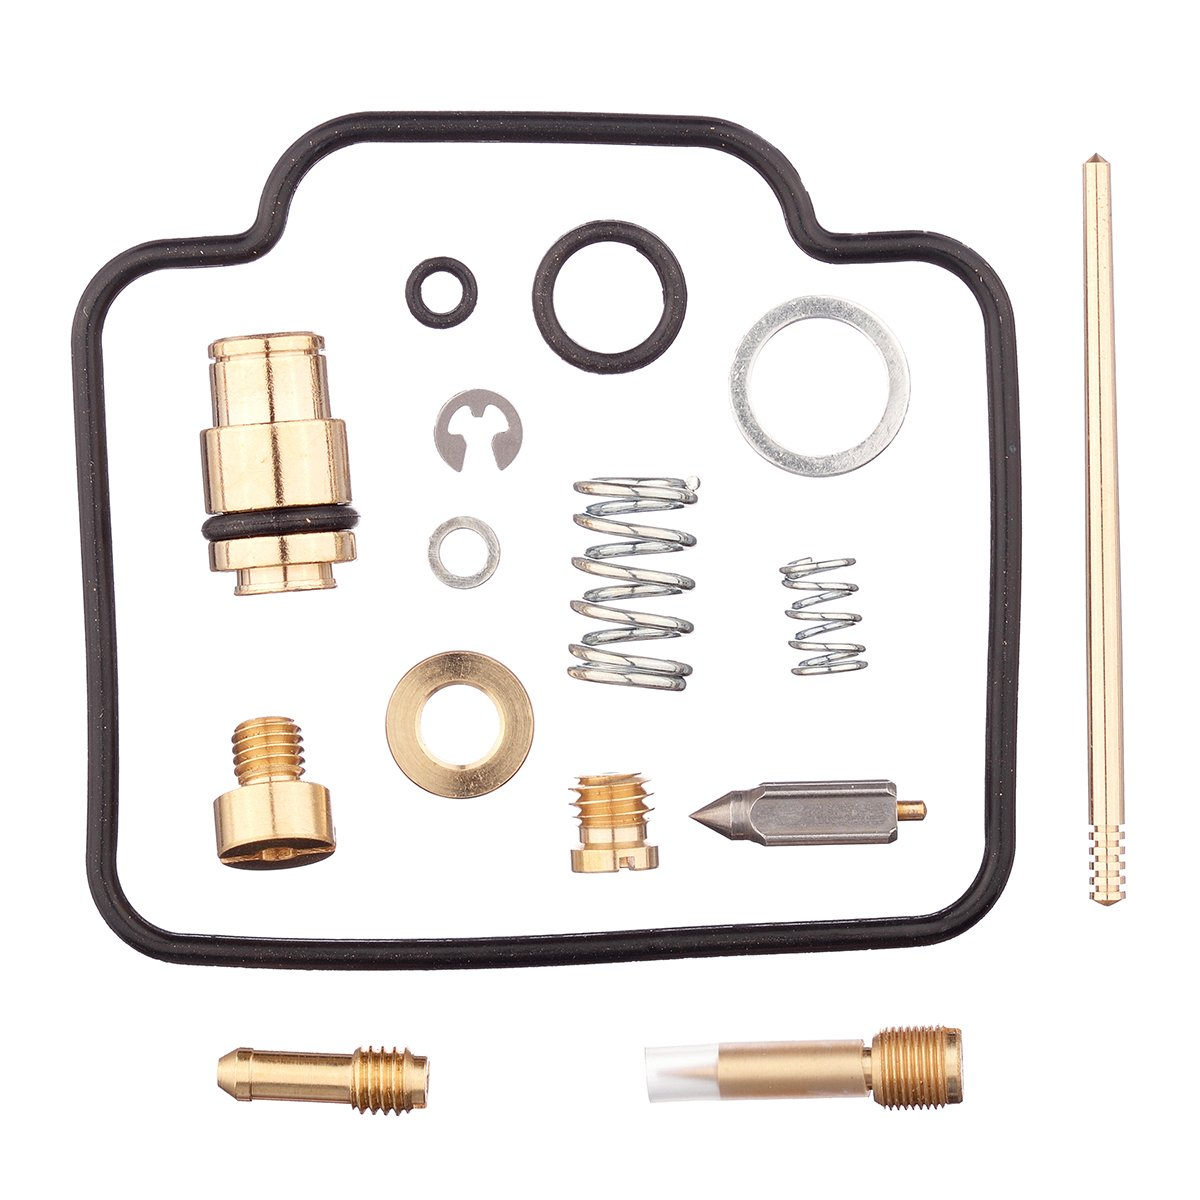 HIFROM Carburetor Carb Rebuild Kit Repair For Suzuki LTF4WDX LT4WDX King Quad 1991 1992 1993 1994 1995 1996 1997 1998 by HIFROM